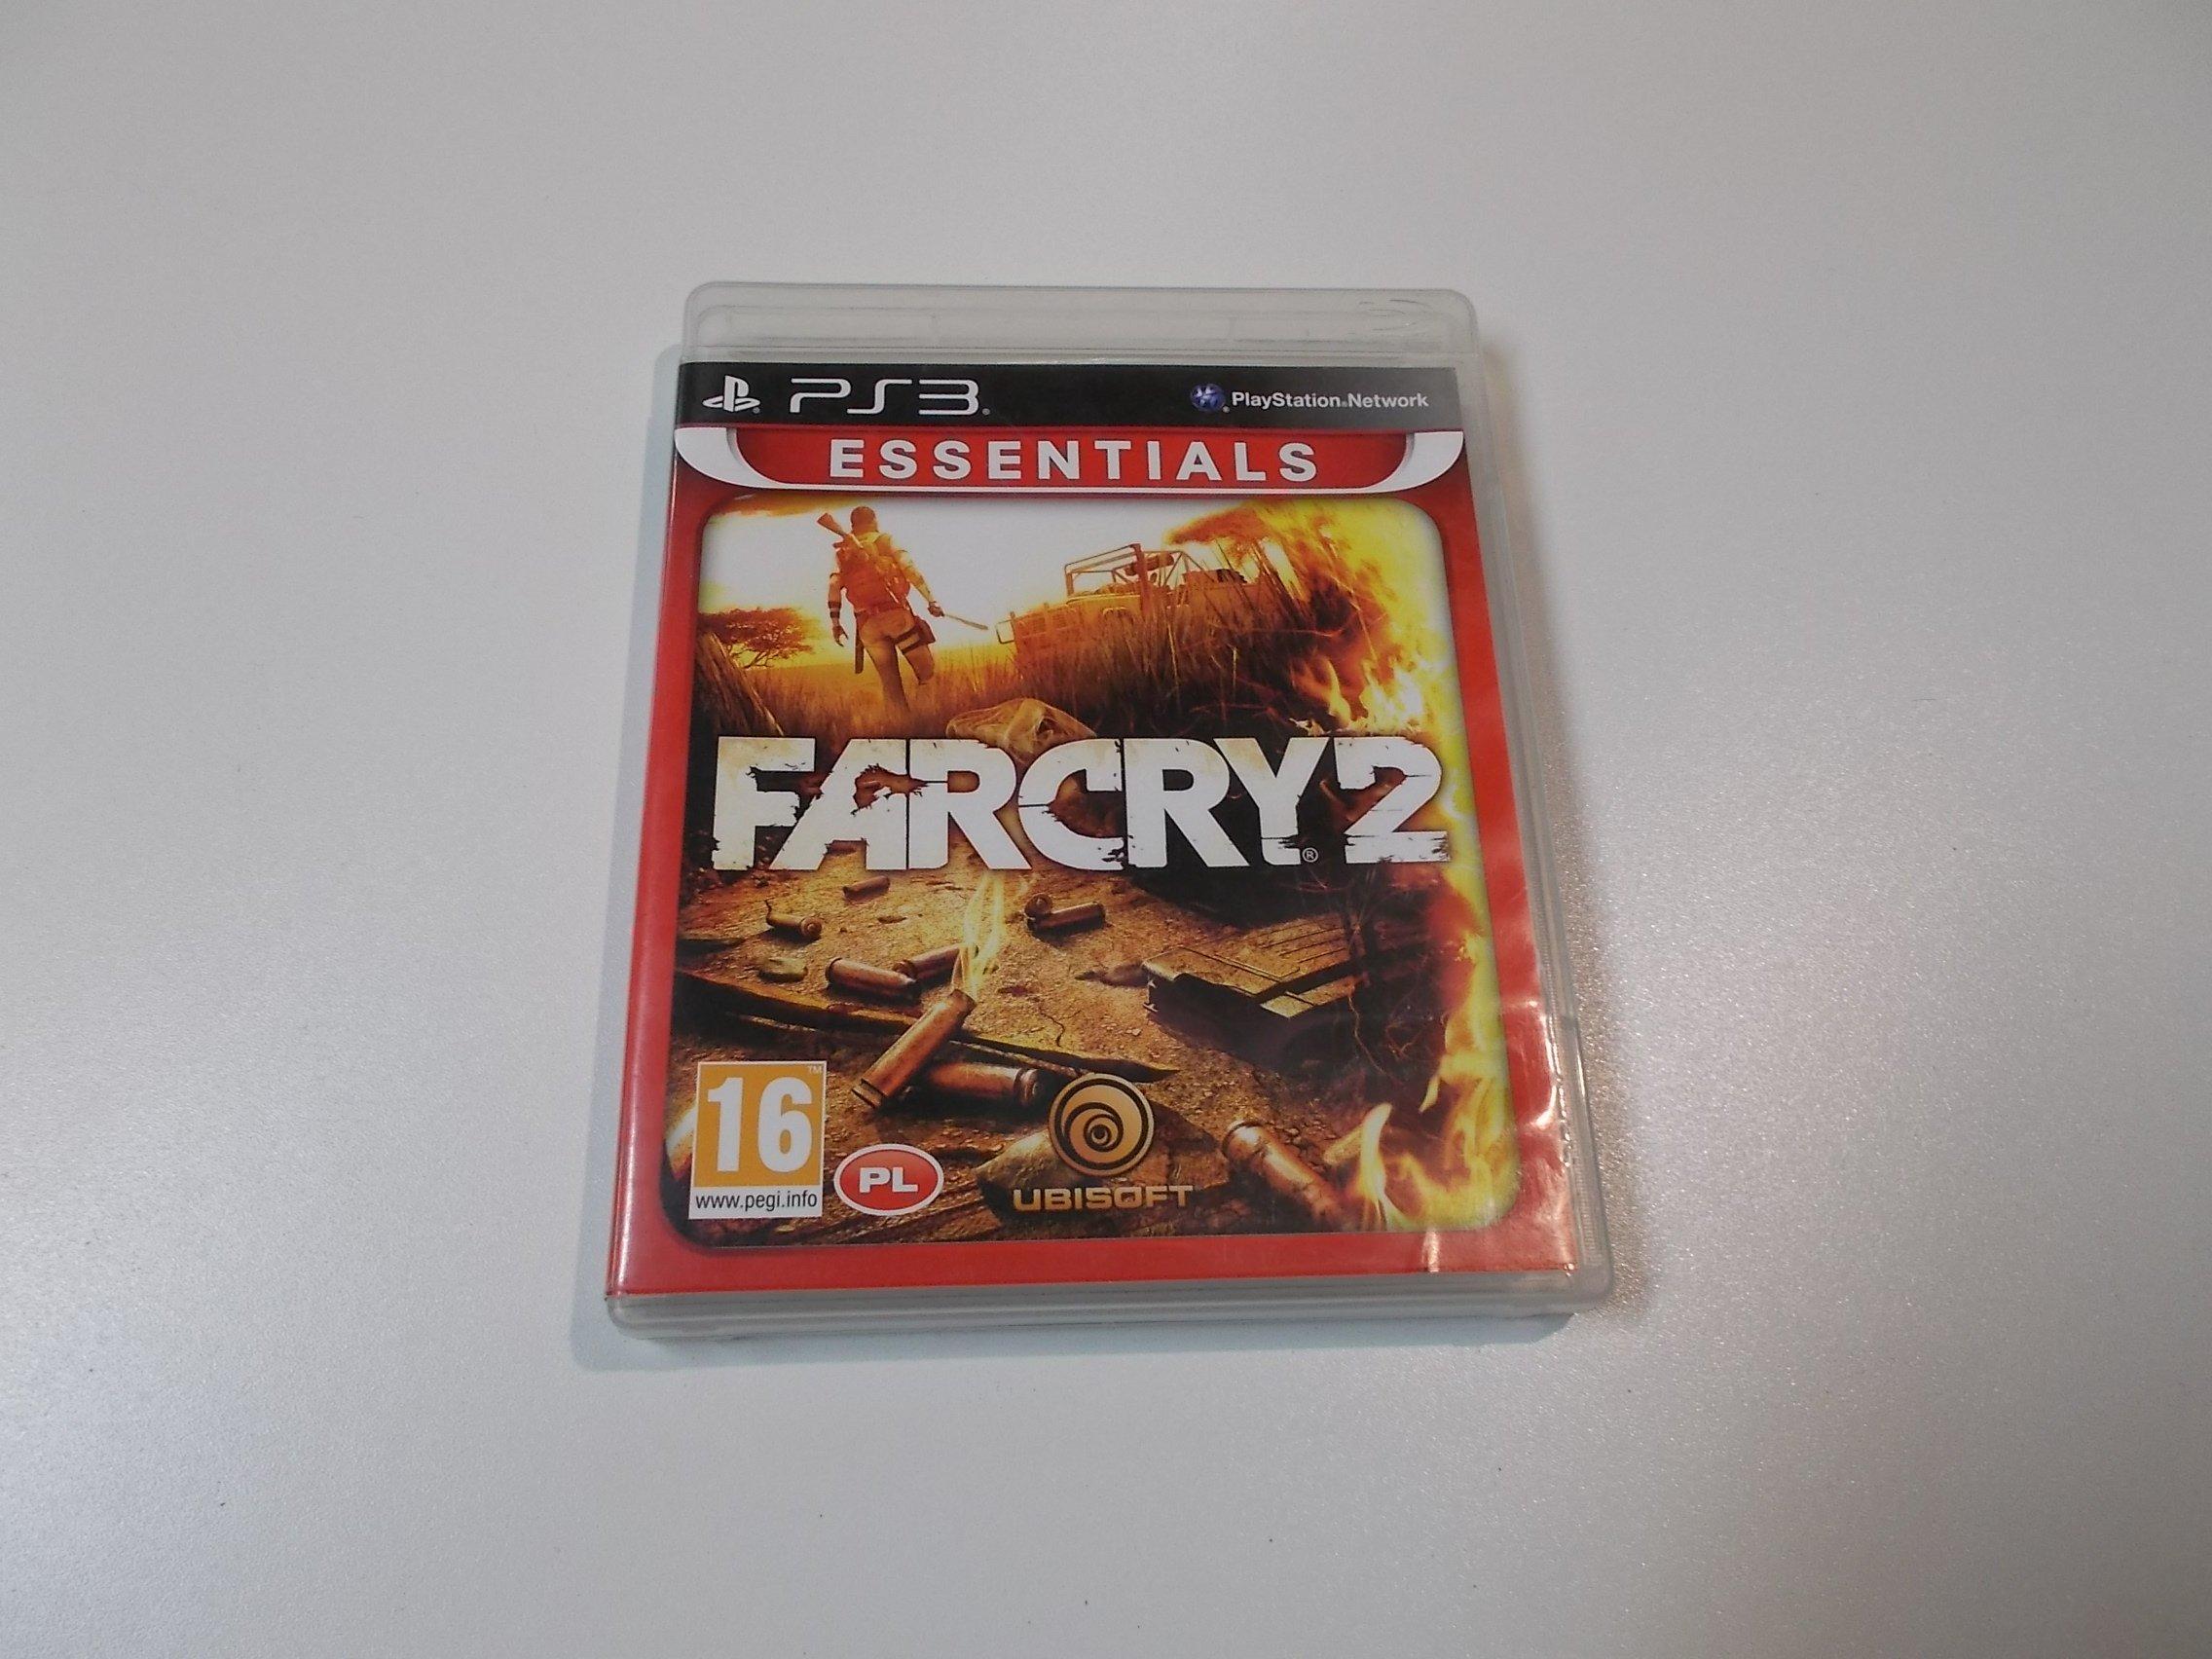 Farcry 2 - GRA Ps3 - Sklep